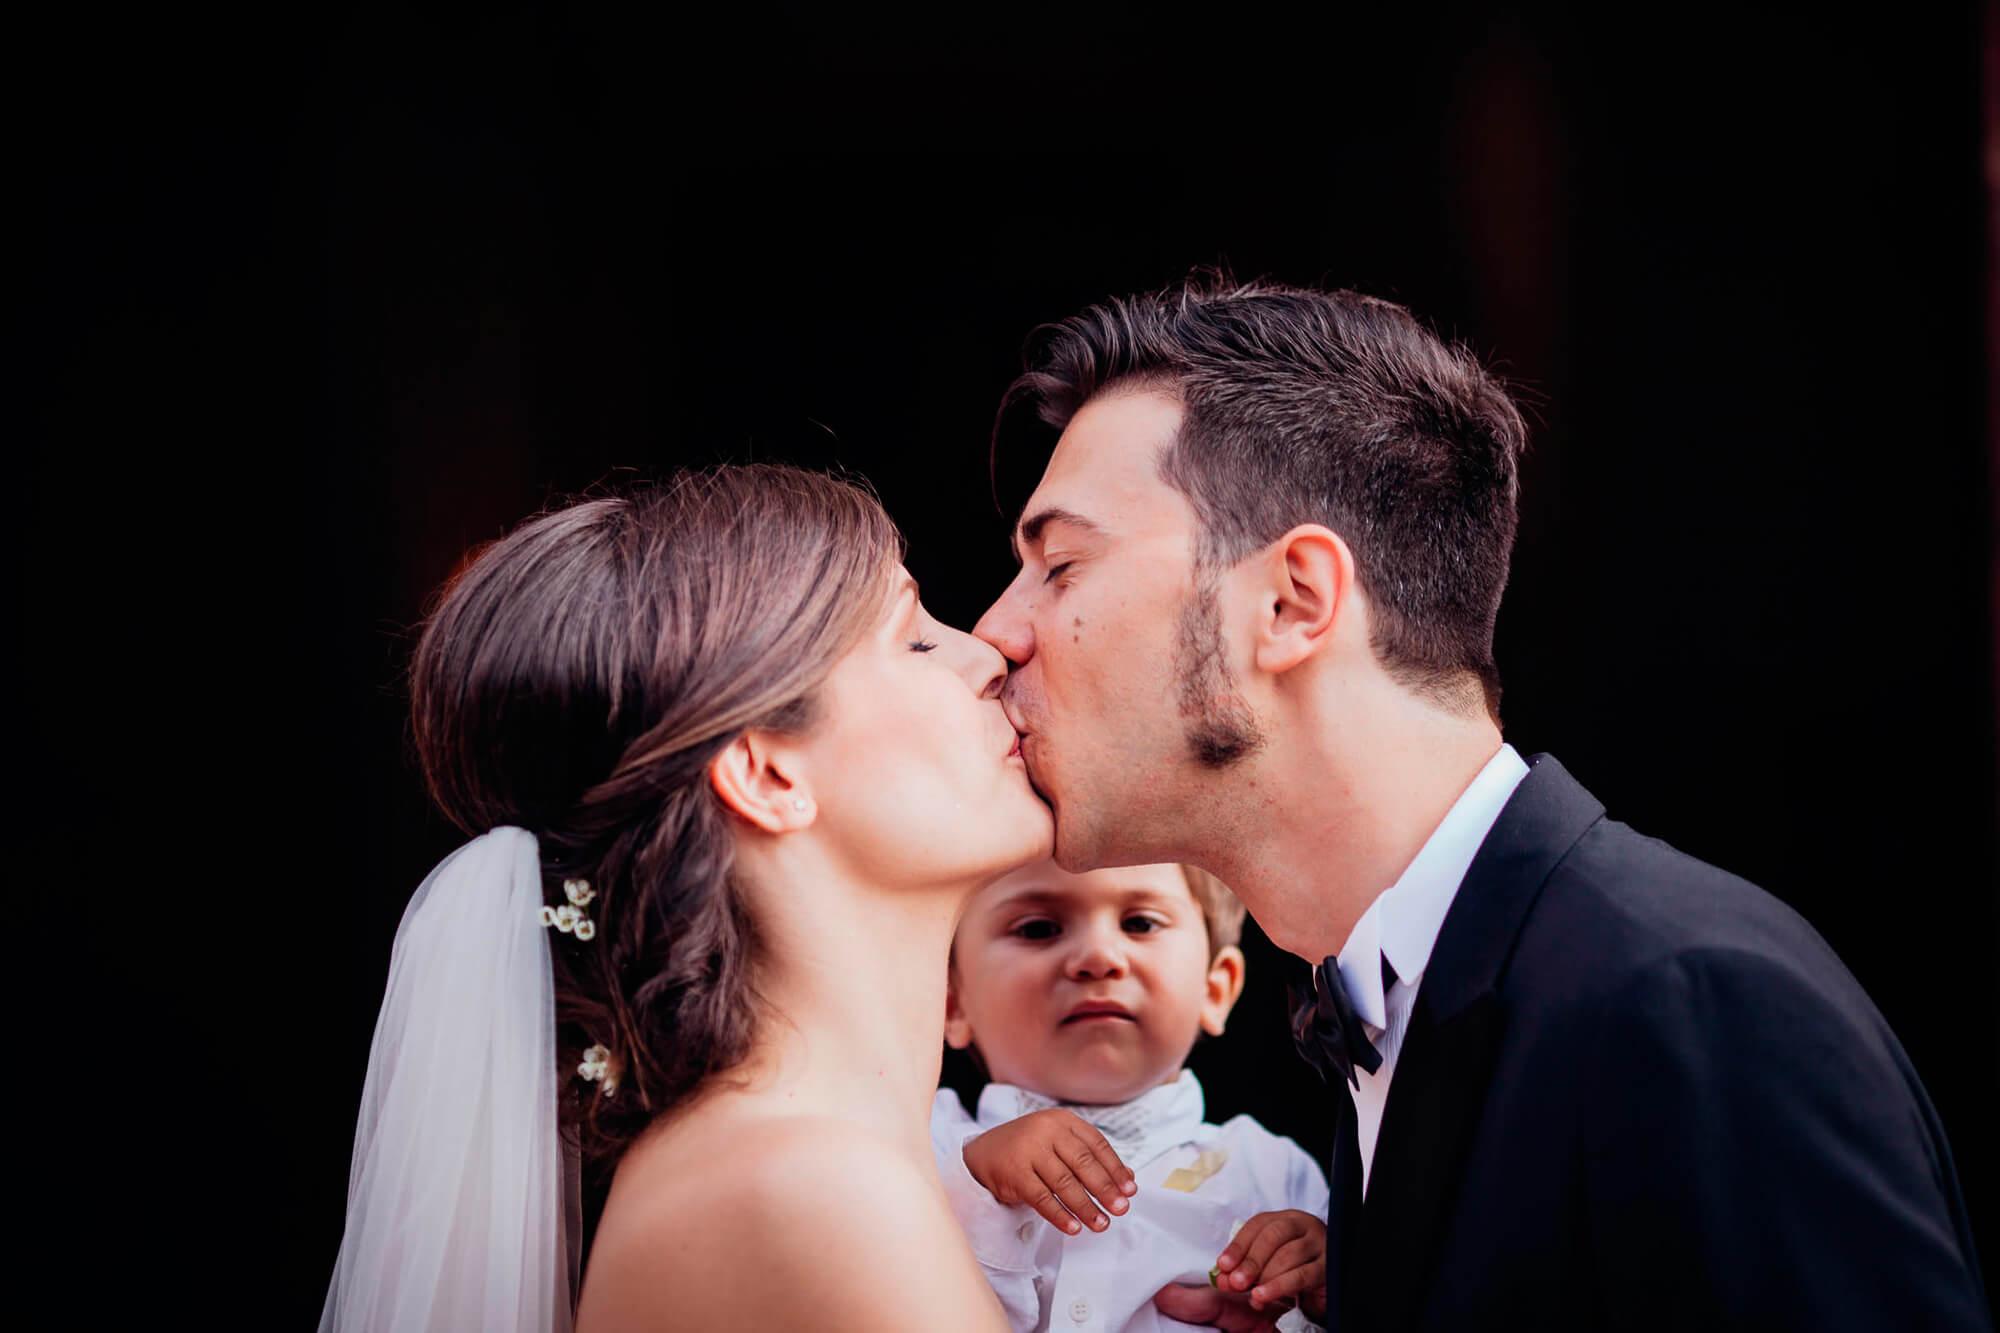 072-arezzo-wedding-photographer.jpg